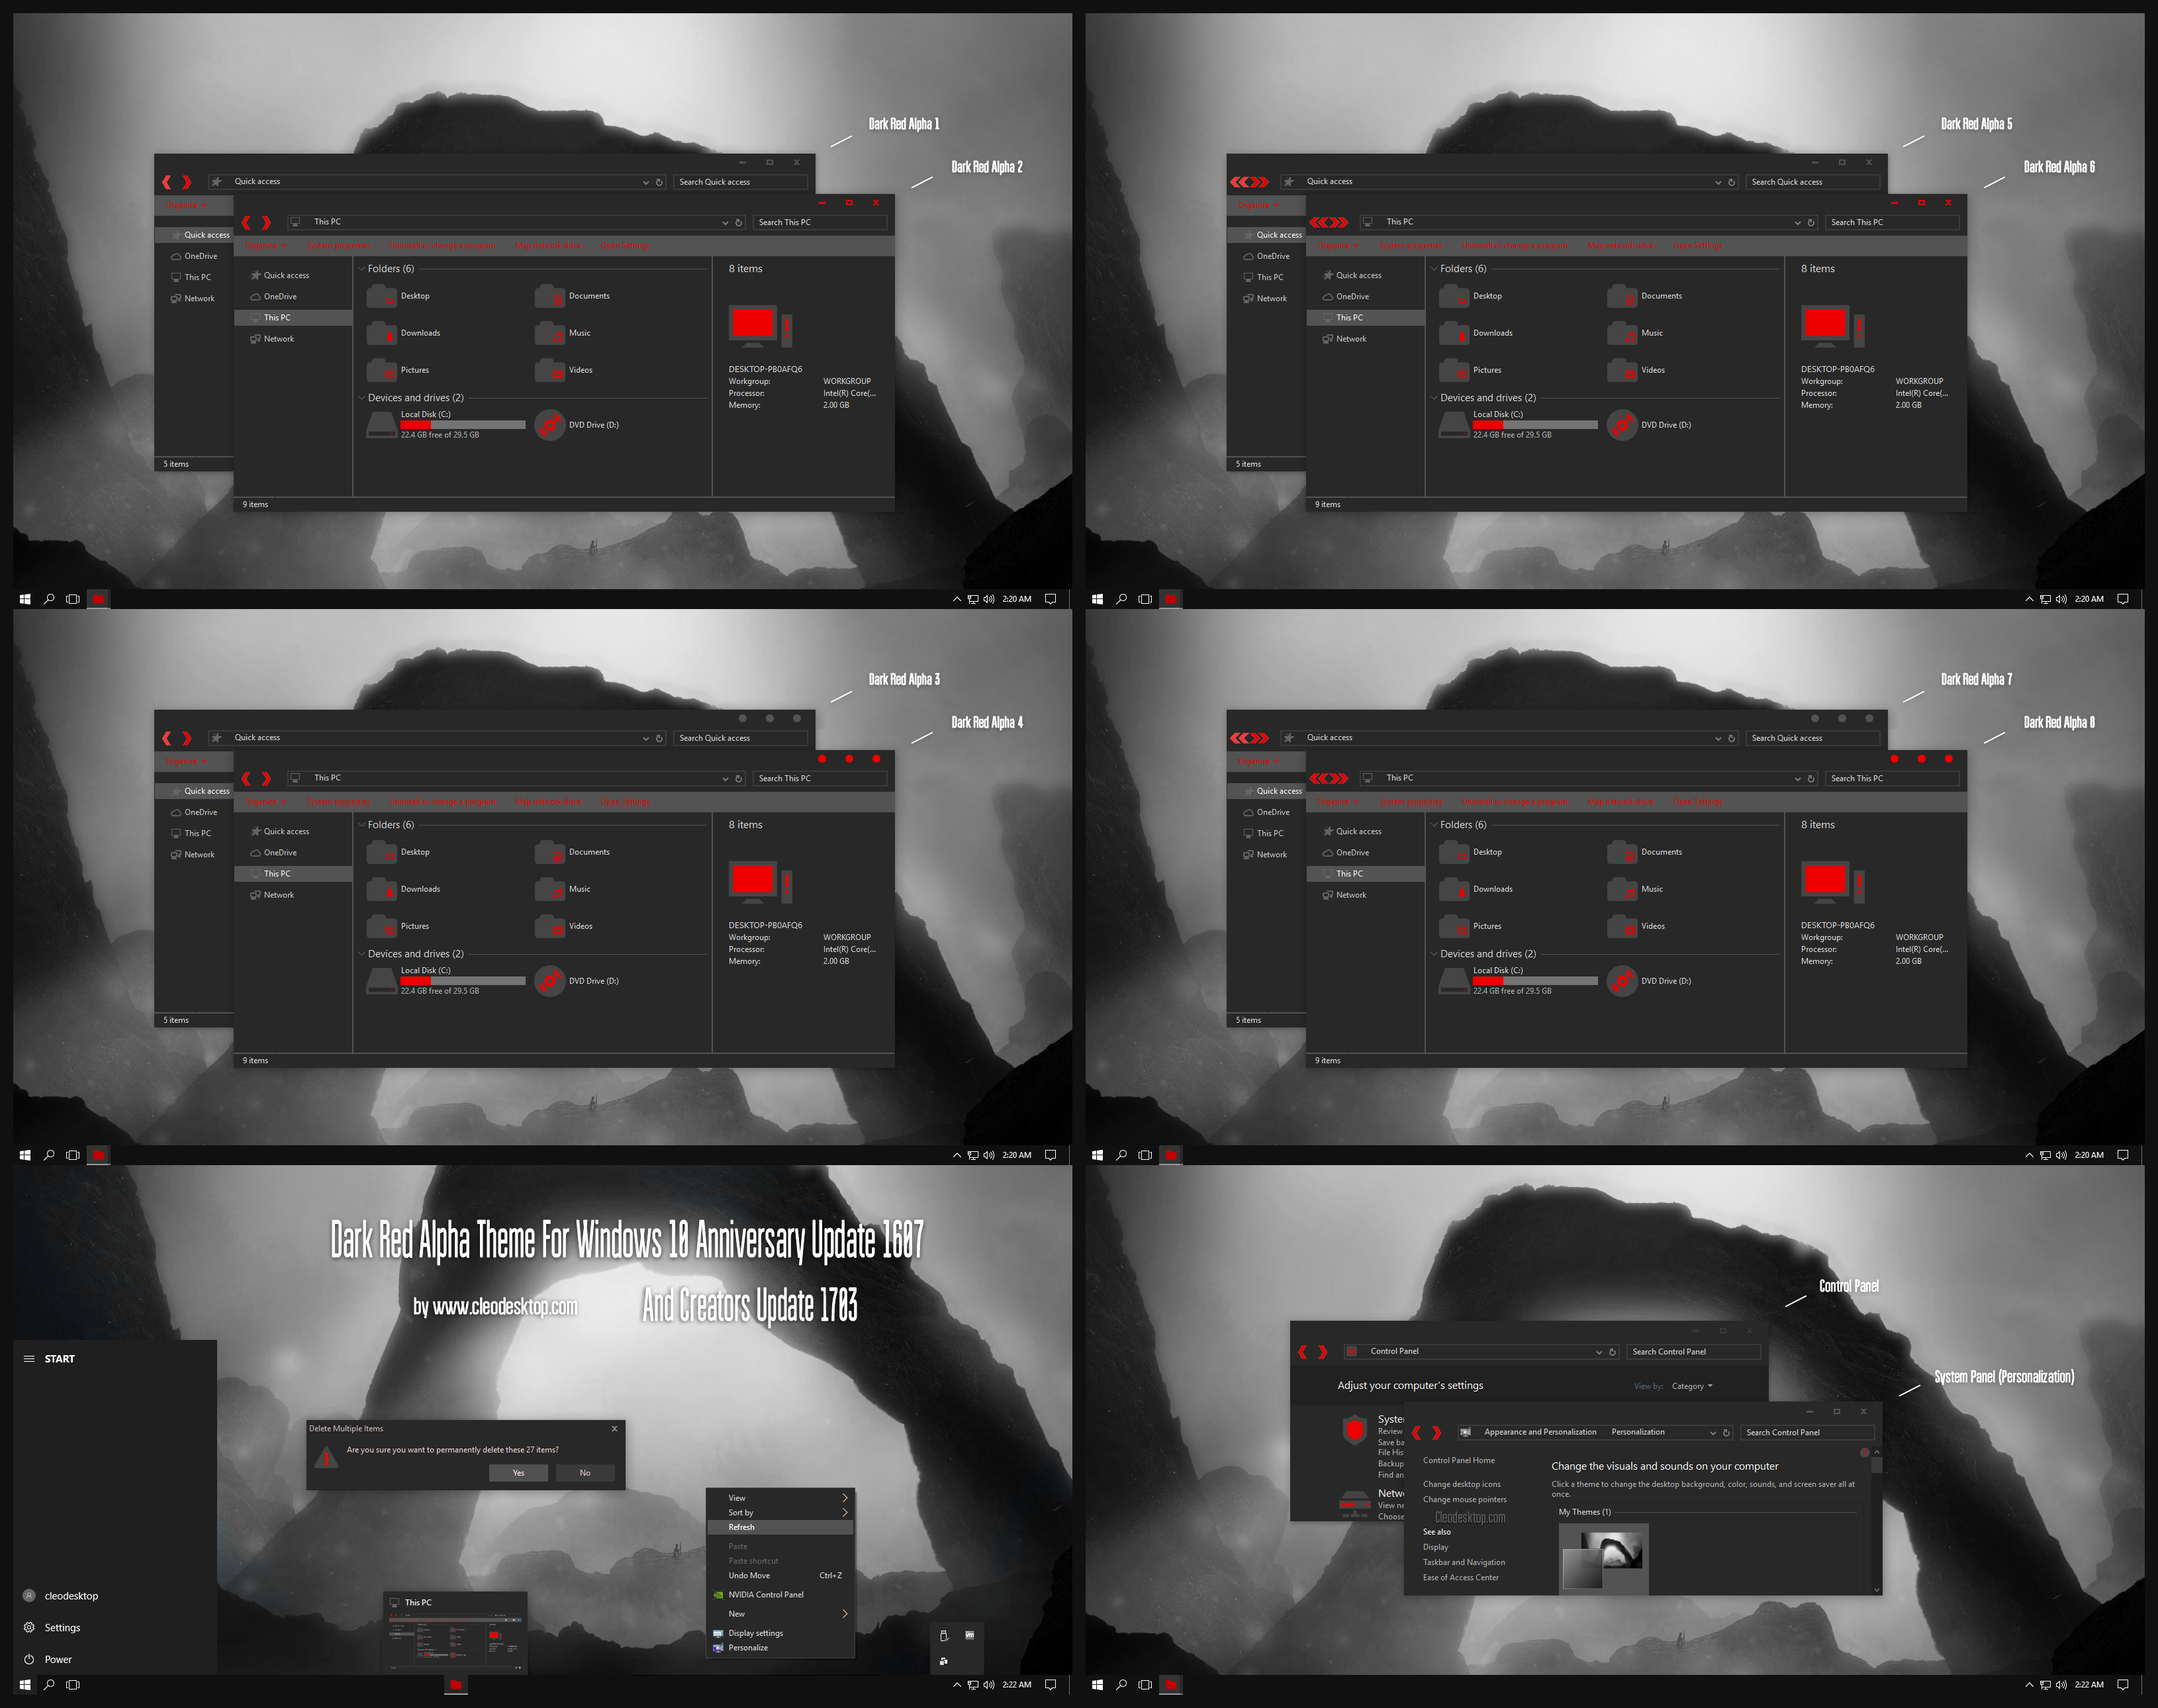 Dark Red Alpha Theme Win10 Creators Update 1703